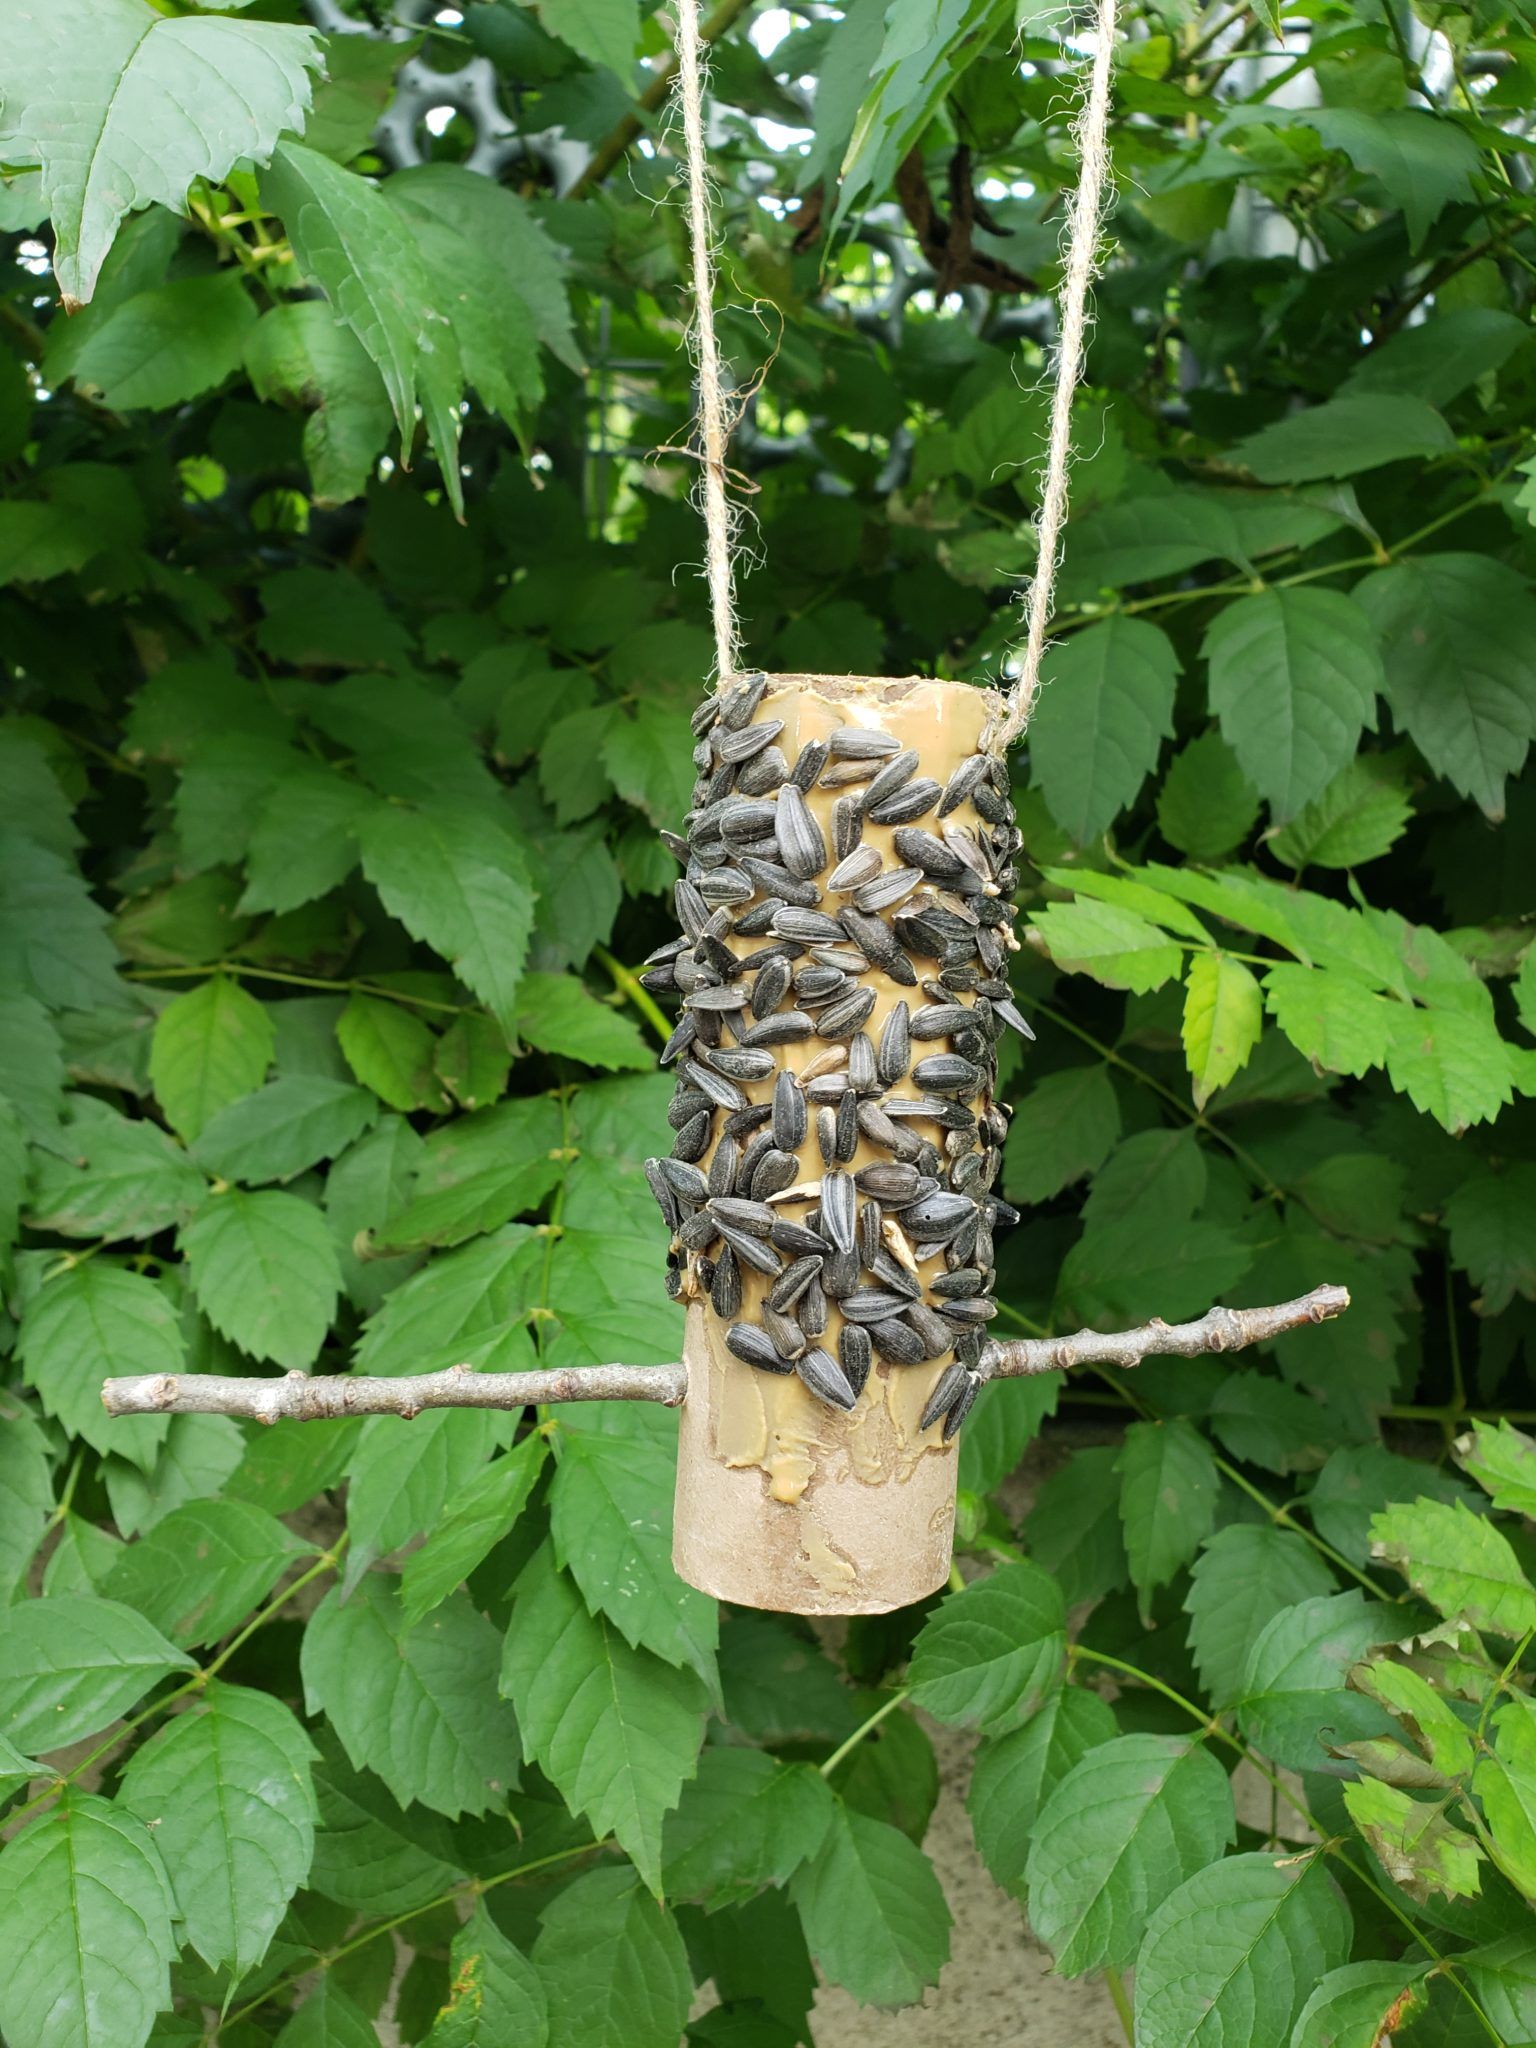 Cardboard bird feeder in nature